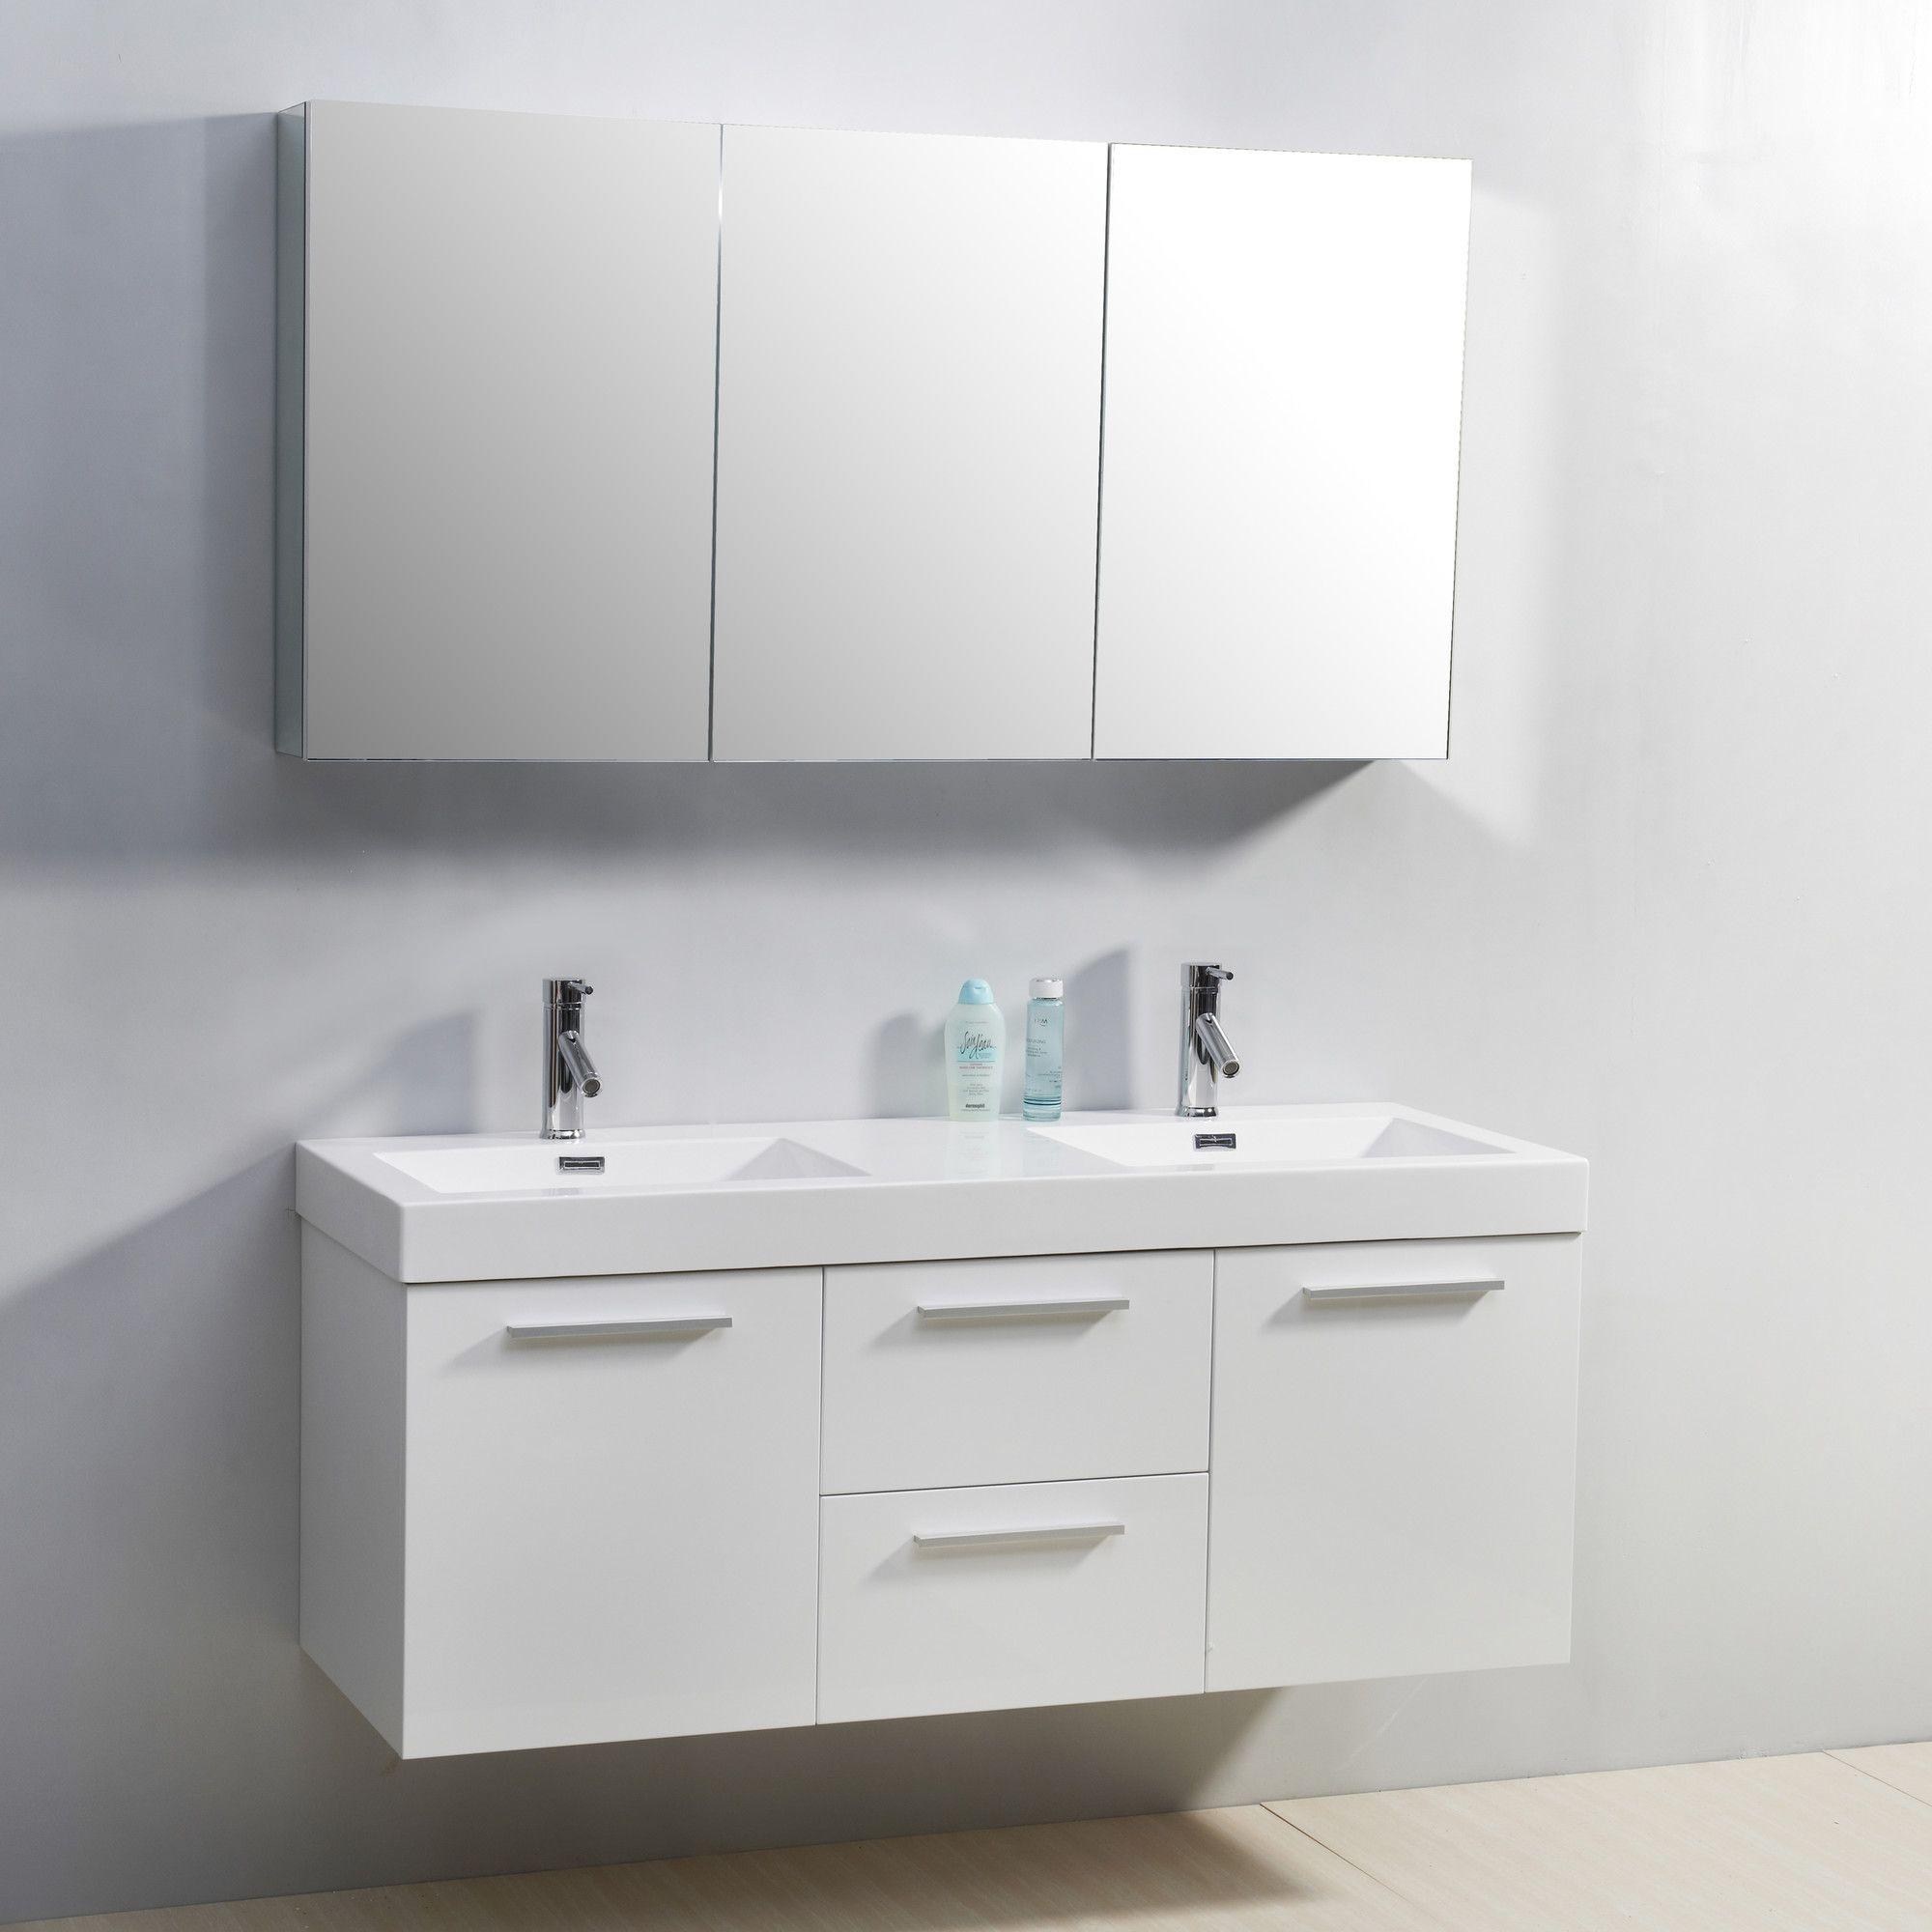 jd best luxury the gr image elegant design inch home of collections virtu grey midori sink vanity double bathroom ideas